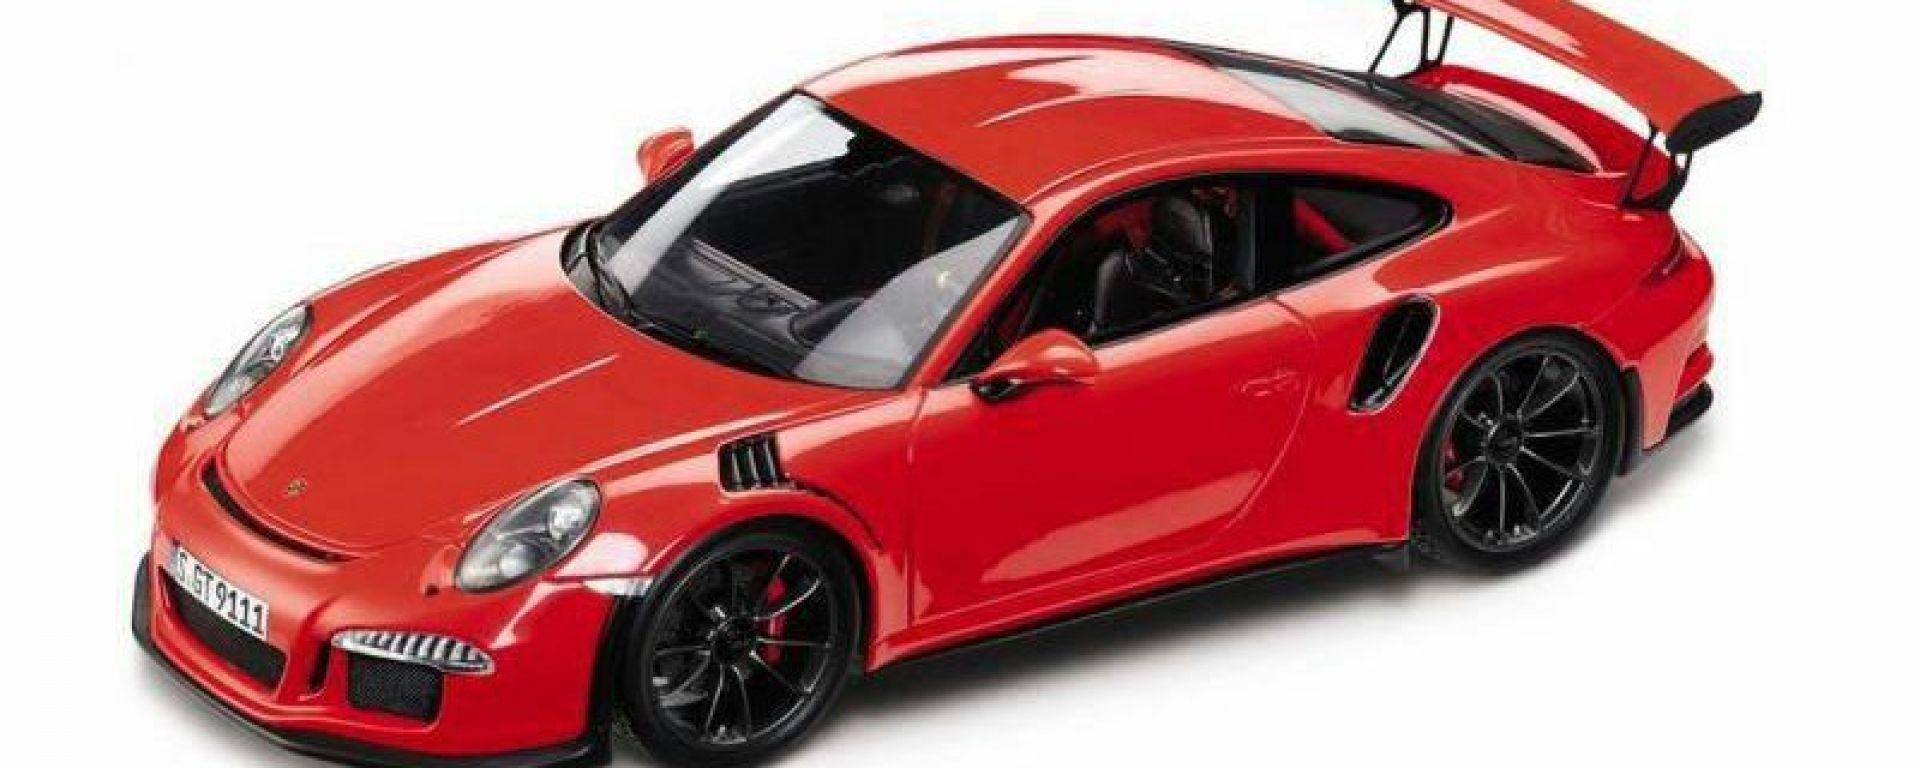 Porsche 911 GT3 RS 2015: sarà così?